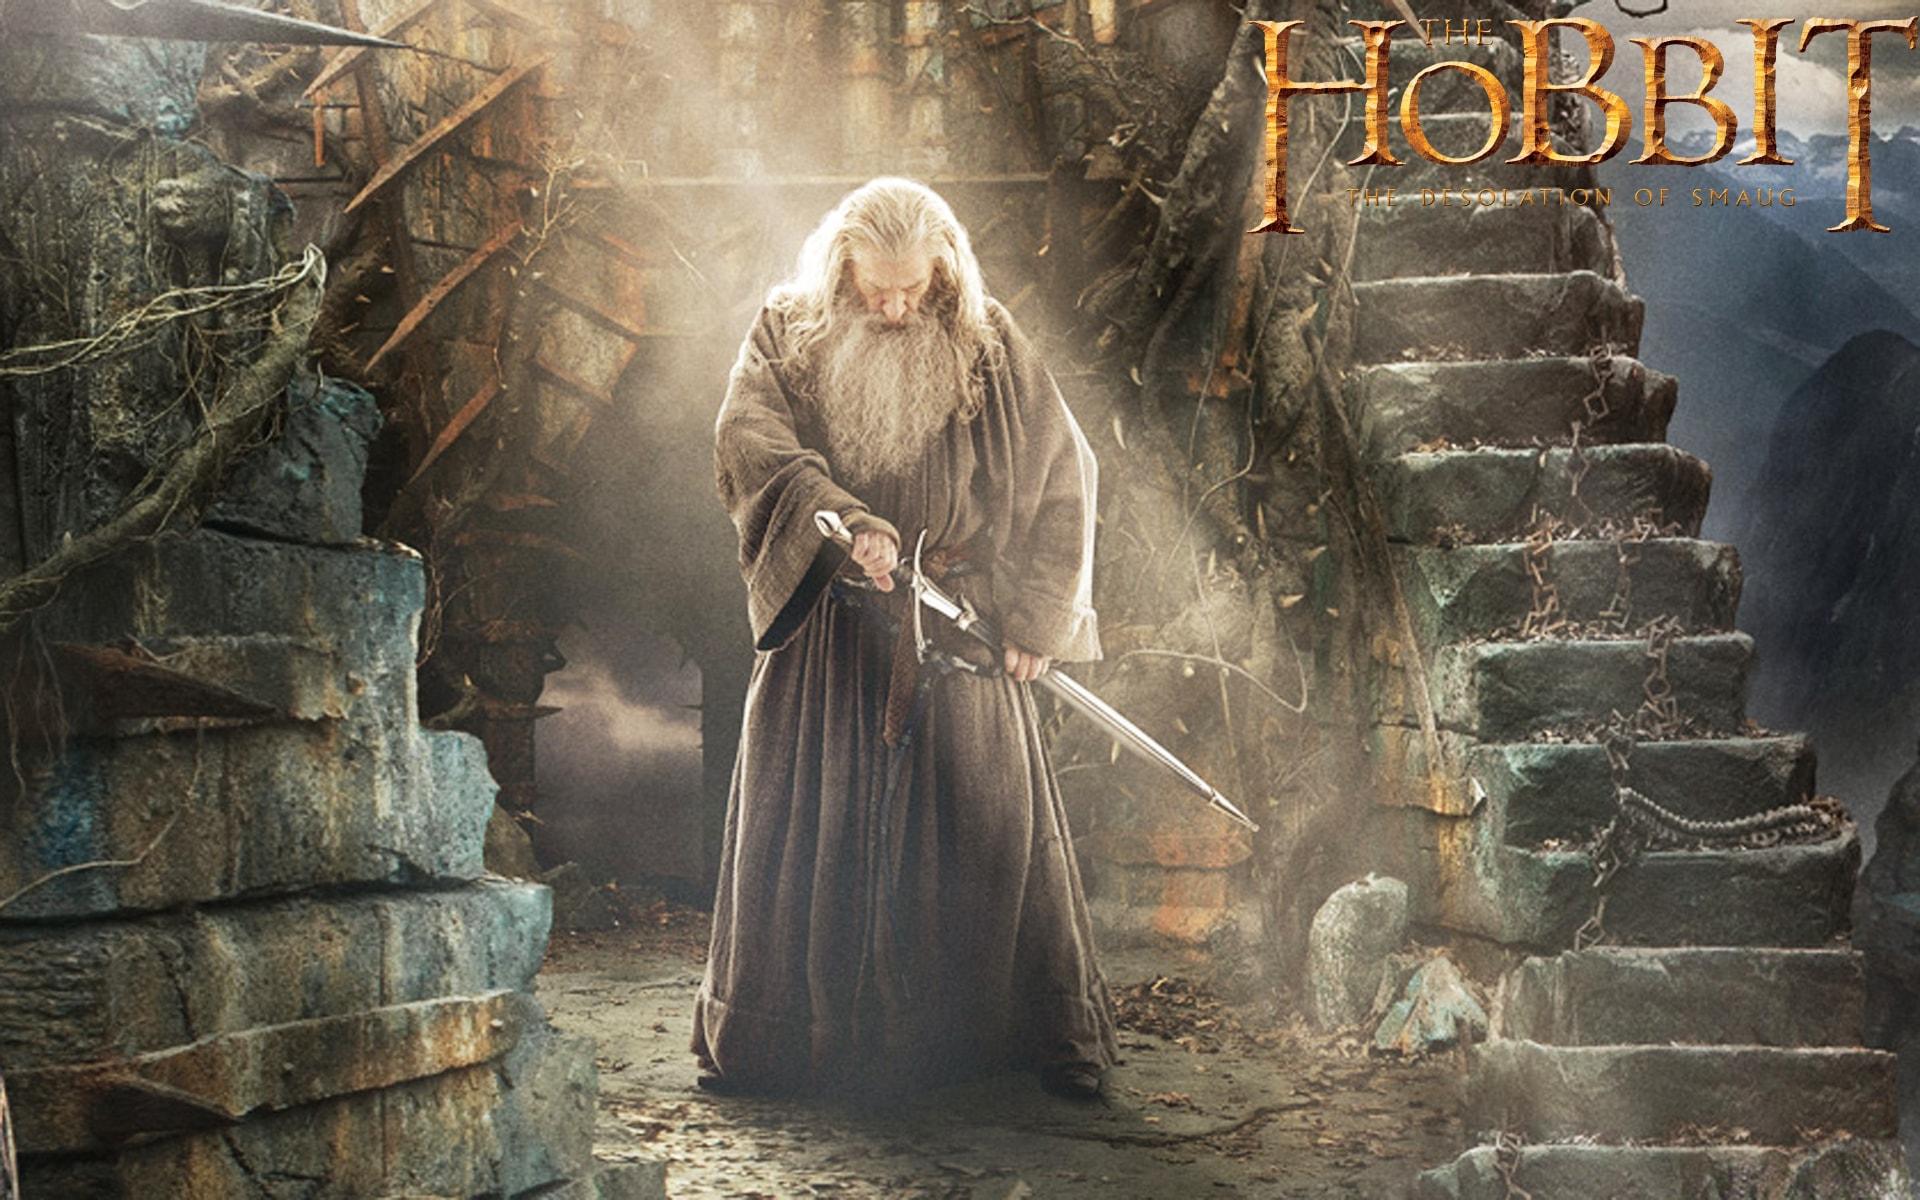 The Hobbit: The Desolation Of Smaug HD